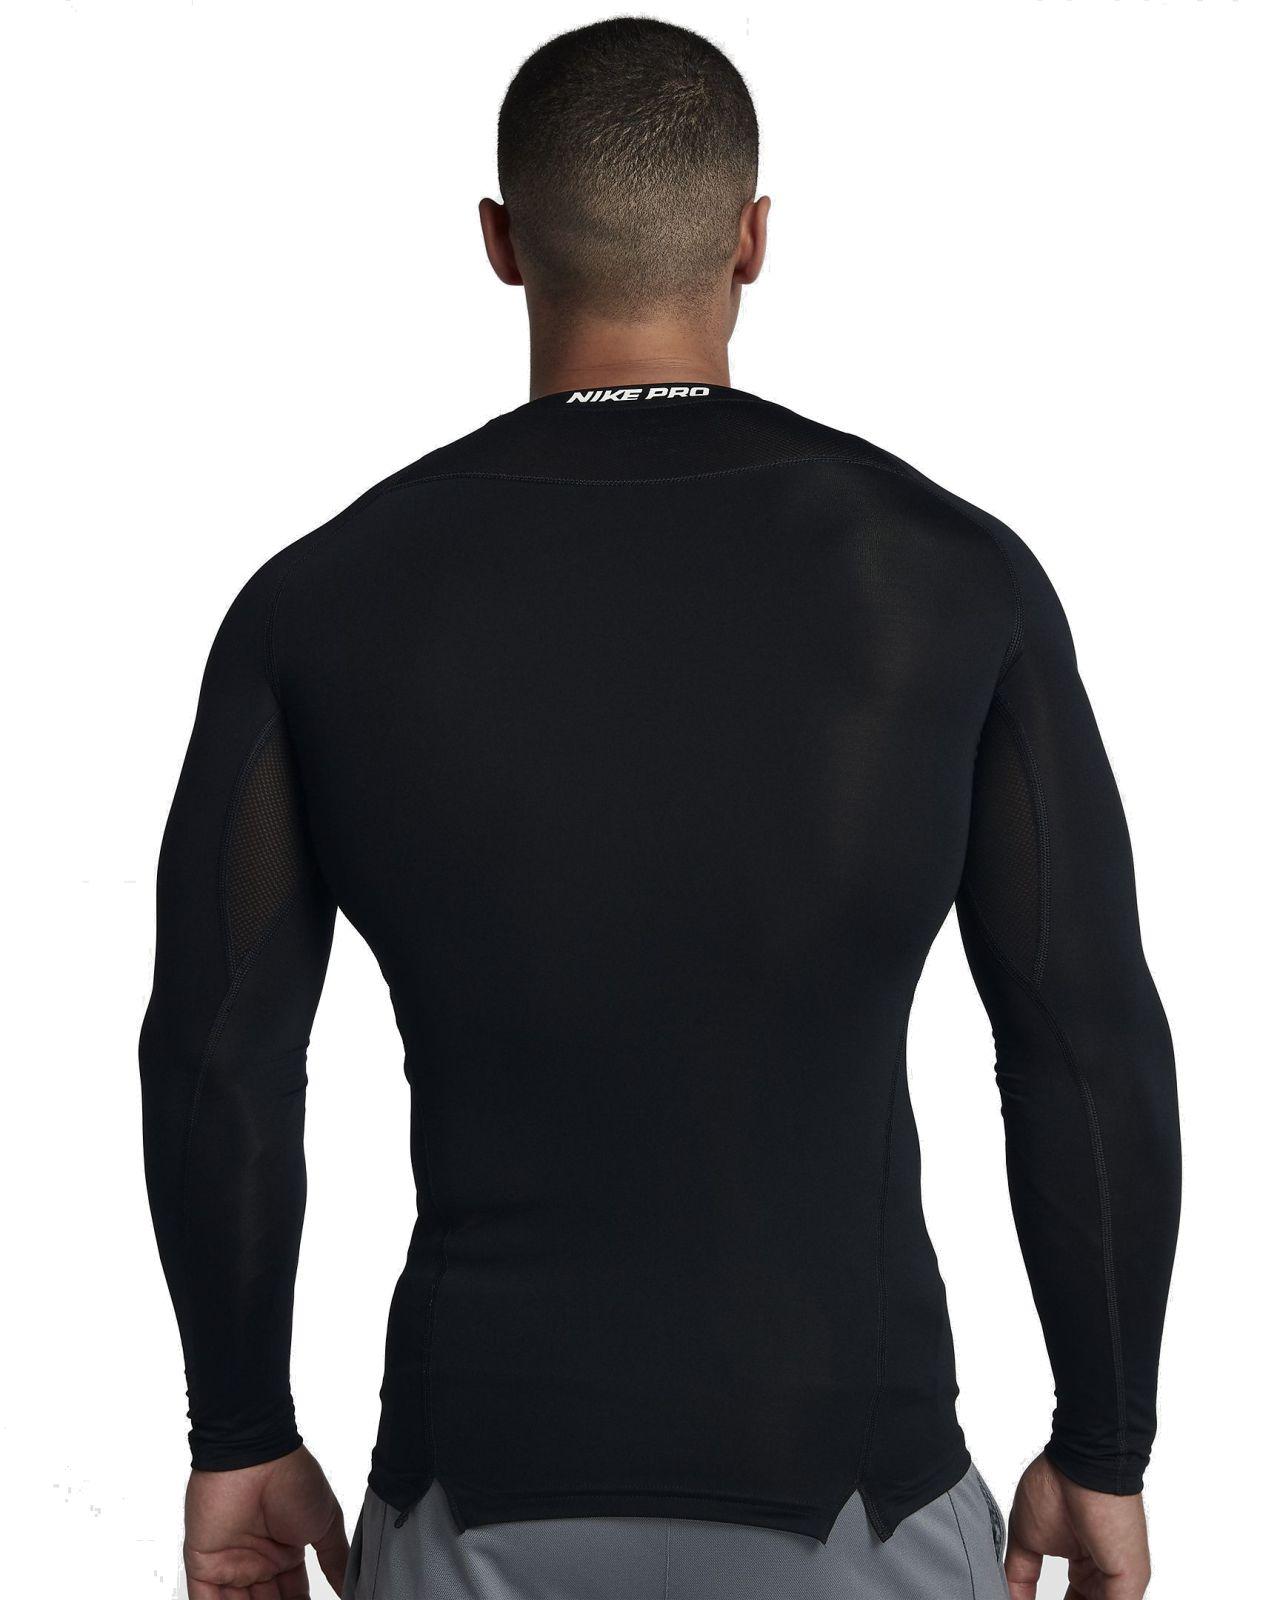 5a31a9f0ede553 Nike Herren langarm Kompressions - Shirt NIKE PRO TOP LS COMP schwarz